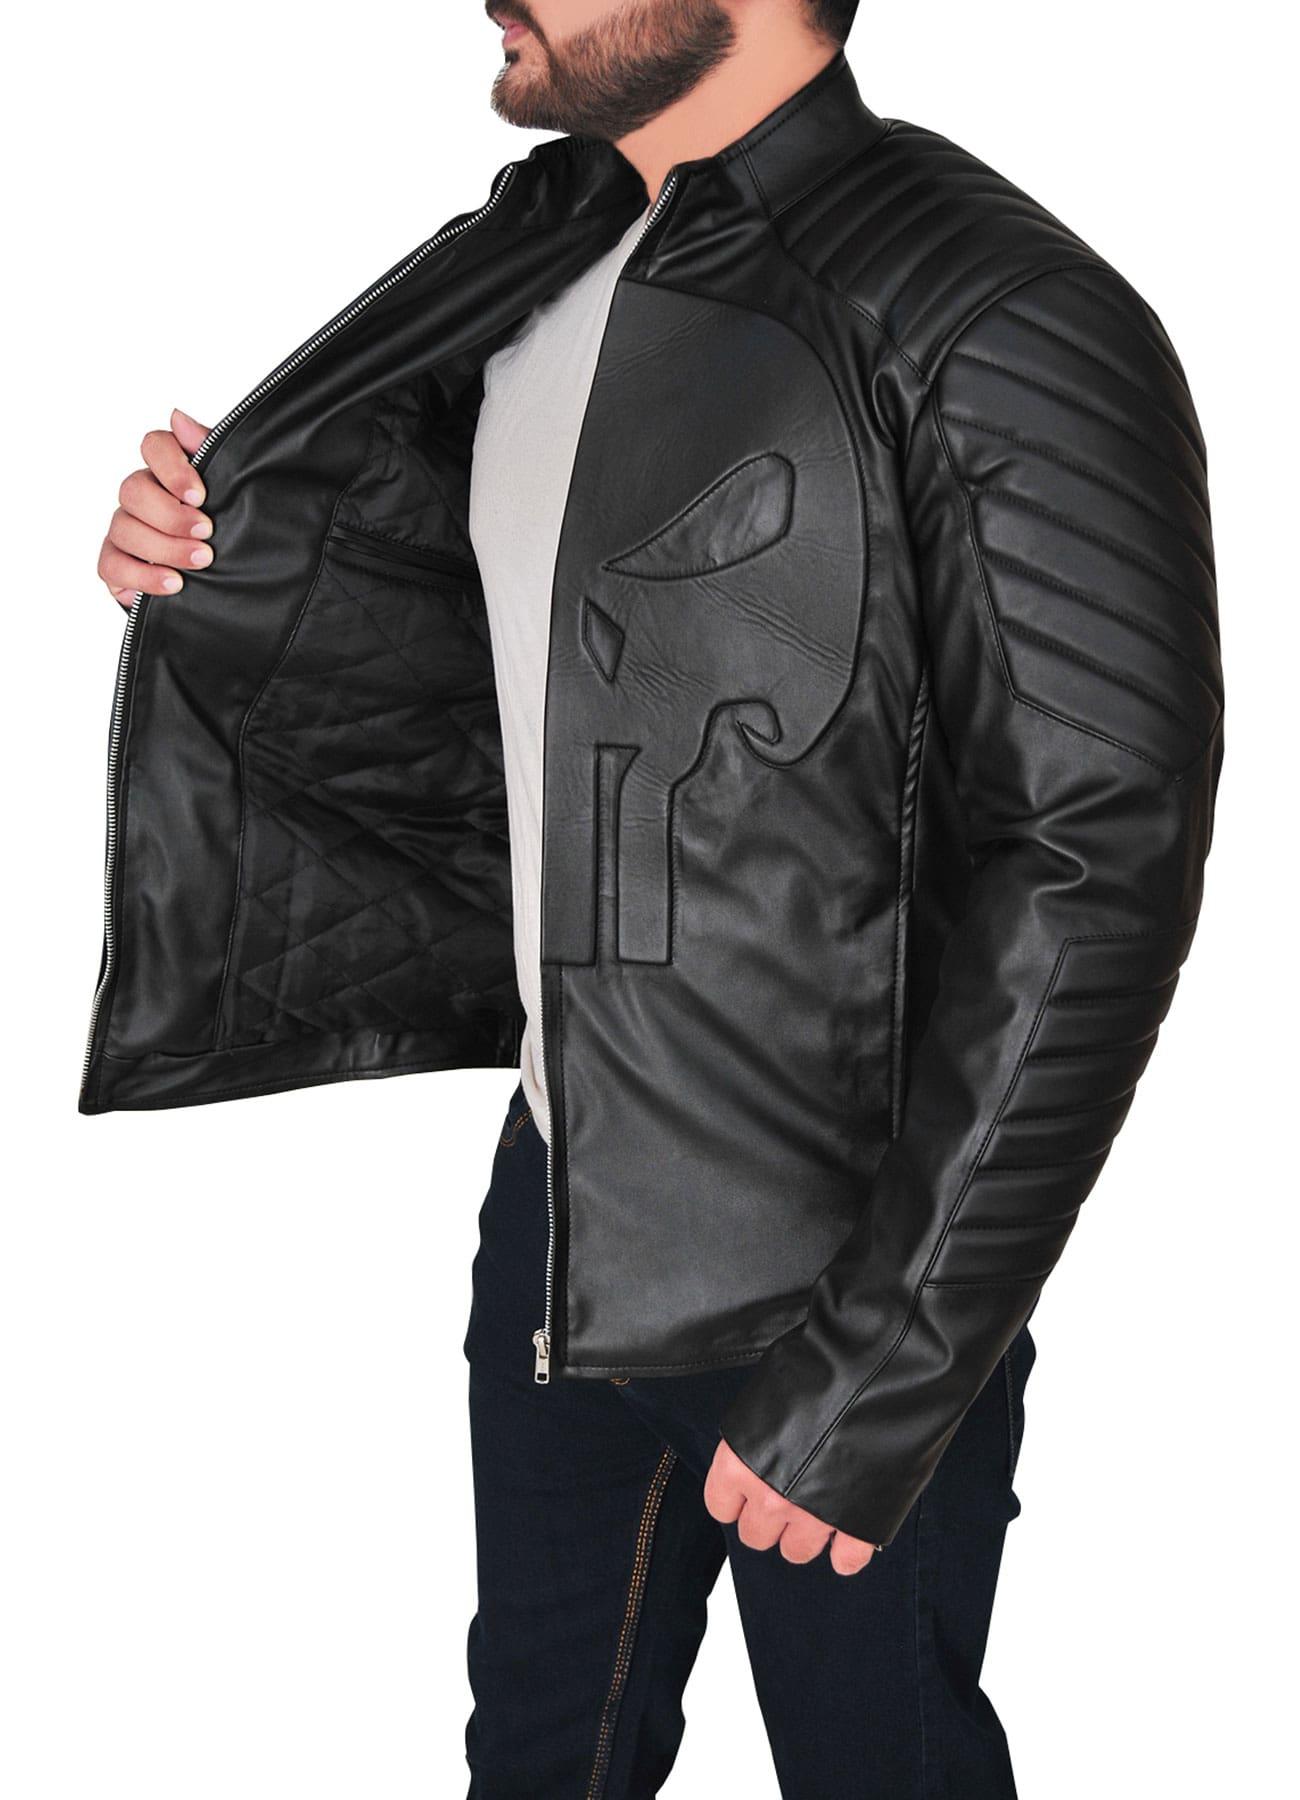 Dapper Trendy Black Skull Faux Leather Jacket